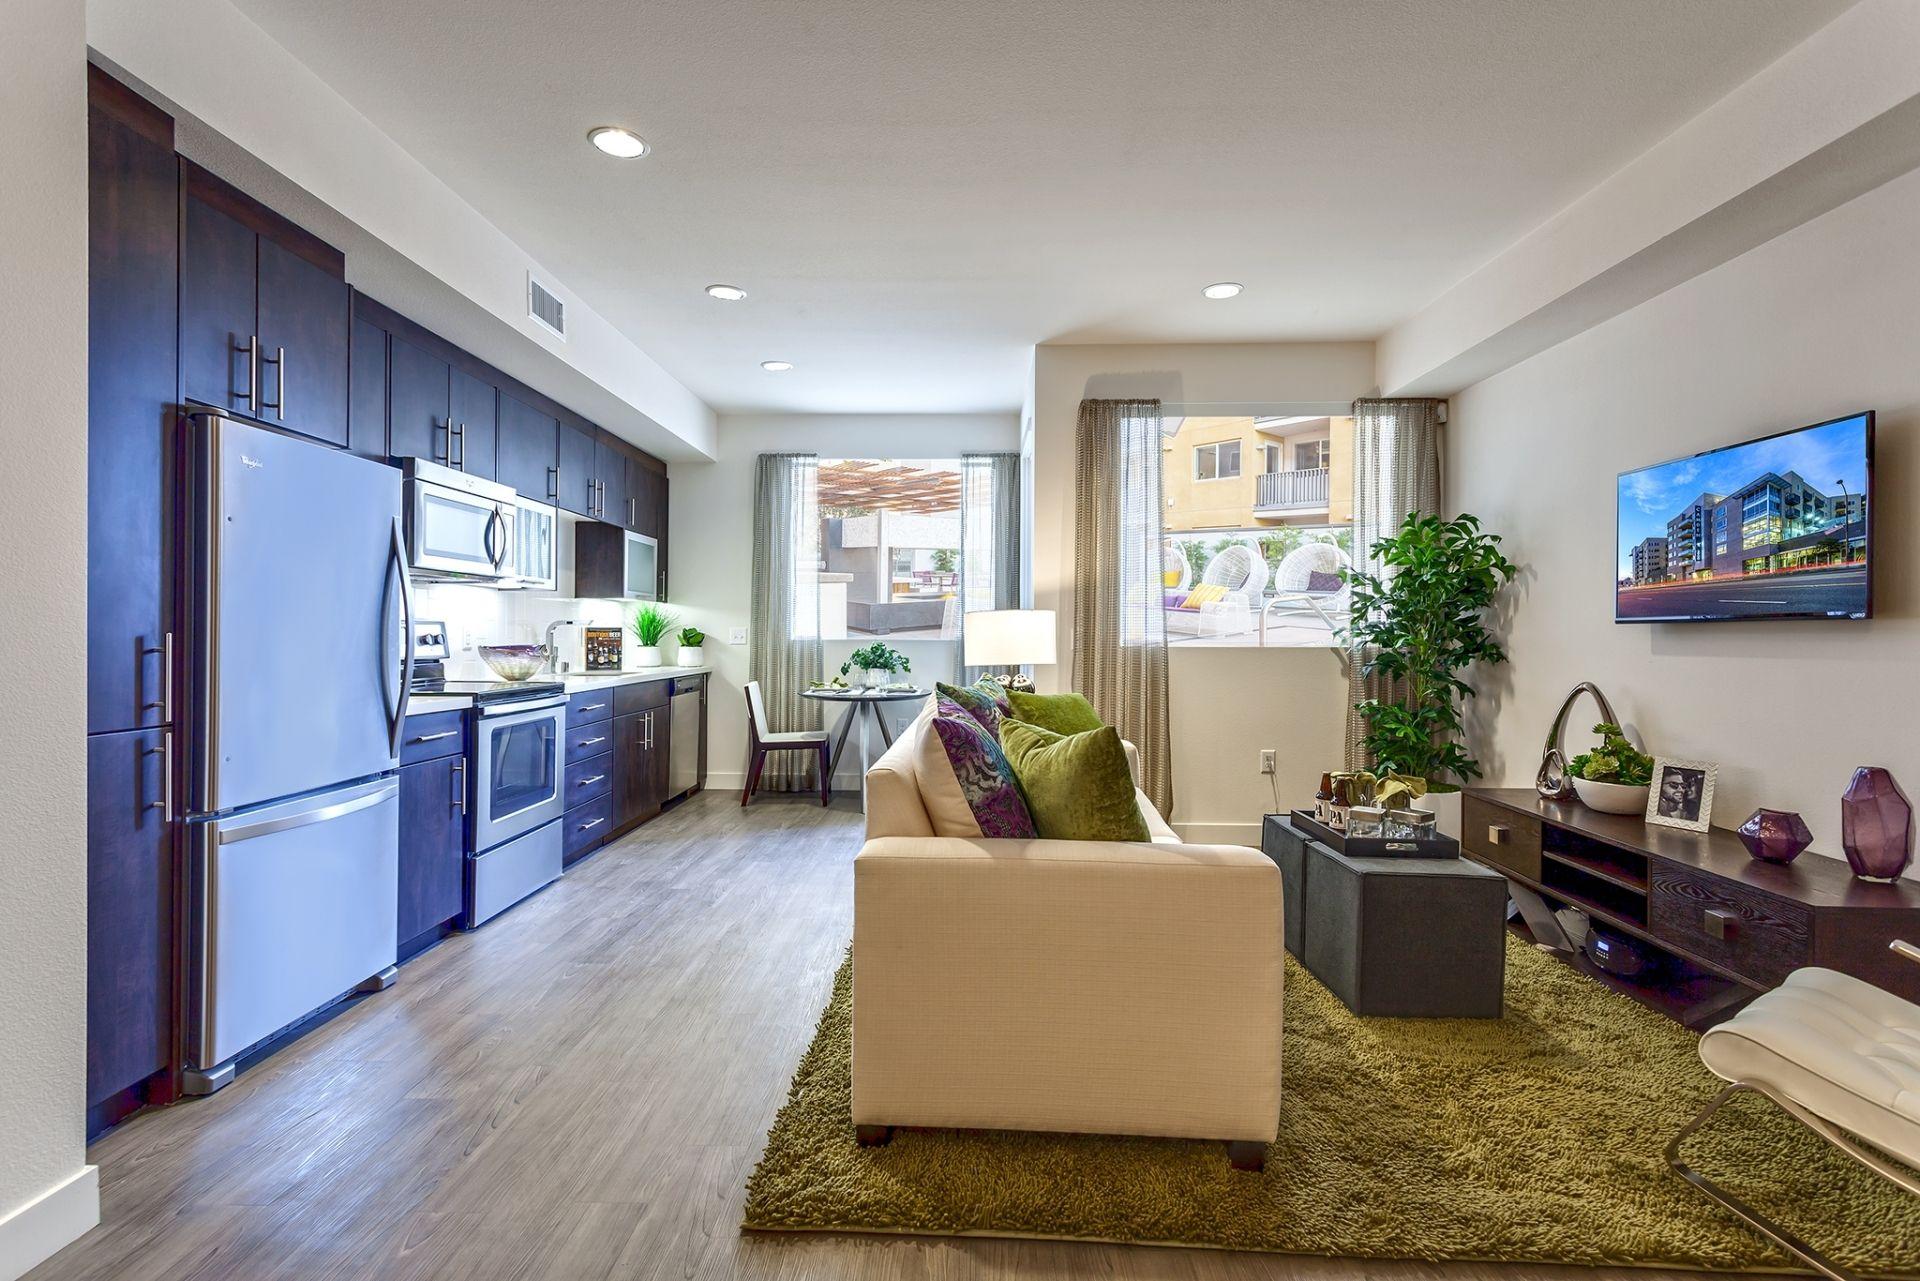 Pin By Monica Lopez Designs On Interior Design In 2020 California Home Decor California Bedroom One Bedroom Apartment